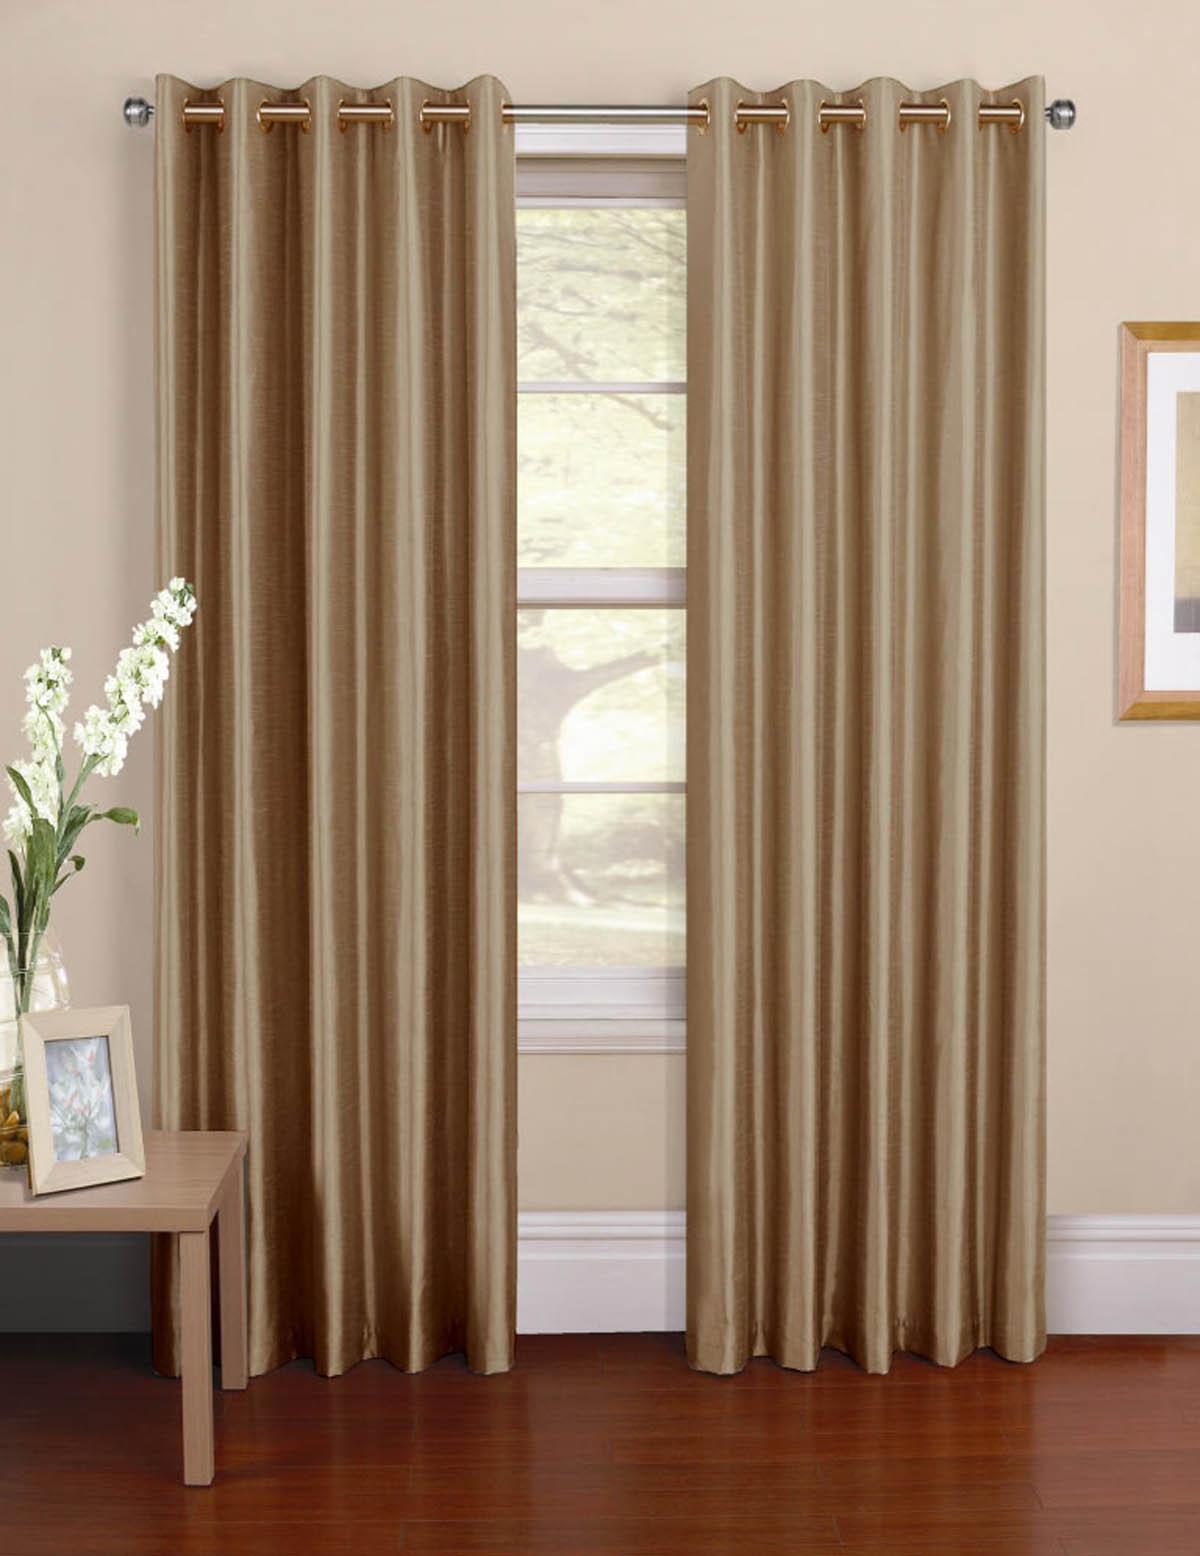 venezia ready made eyelet curtains XDKGNTU